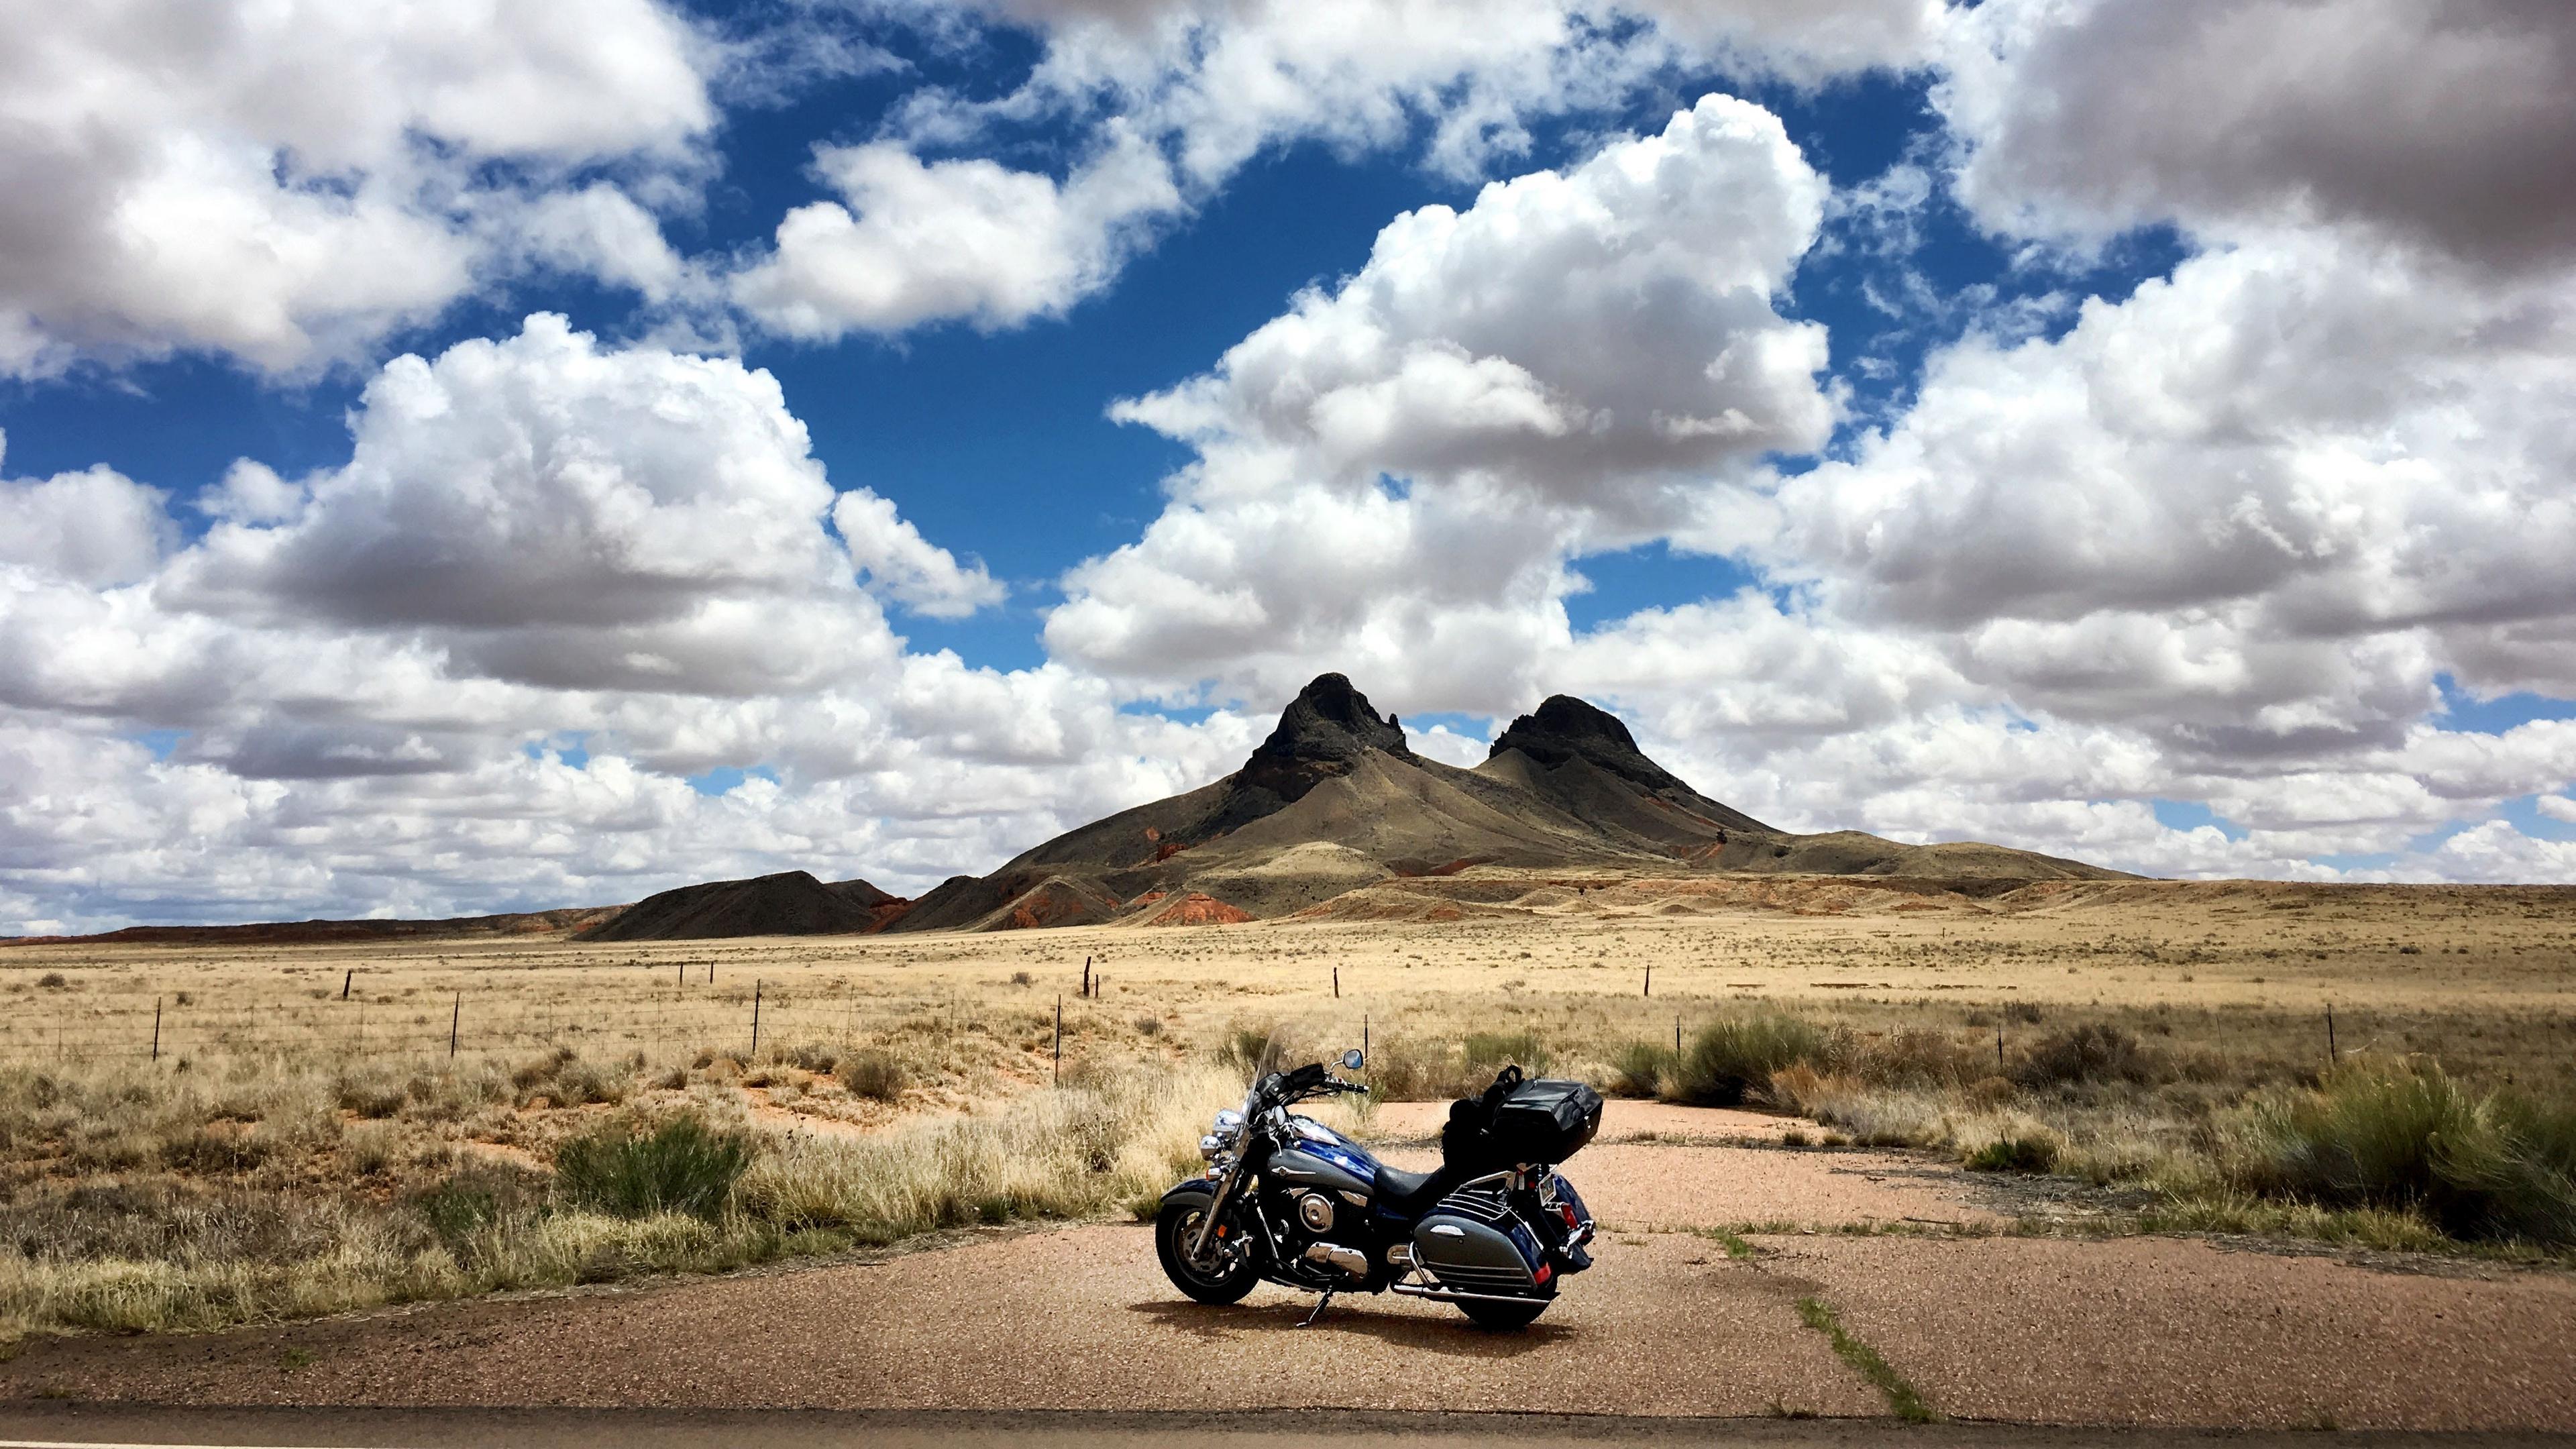 motorcycle mountains desert clouds travel 4k 1536018337 - motorcycle, mountains, desert, clouds, travel 4k - Mountains, Motorcycle, Desert